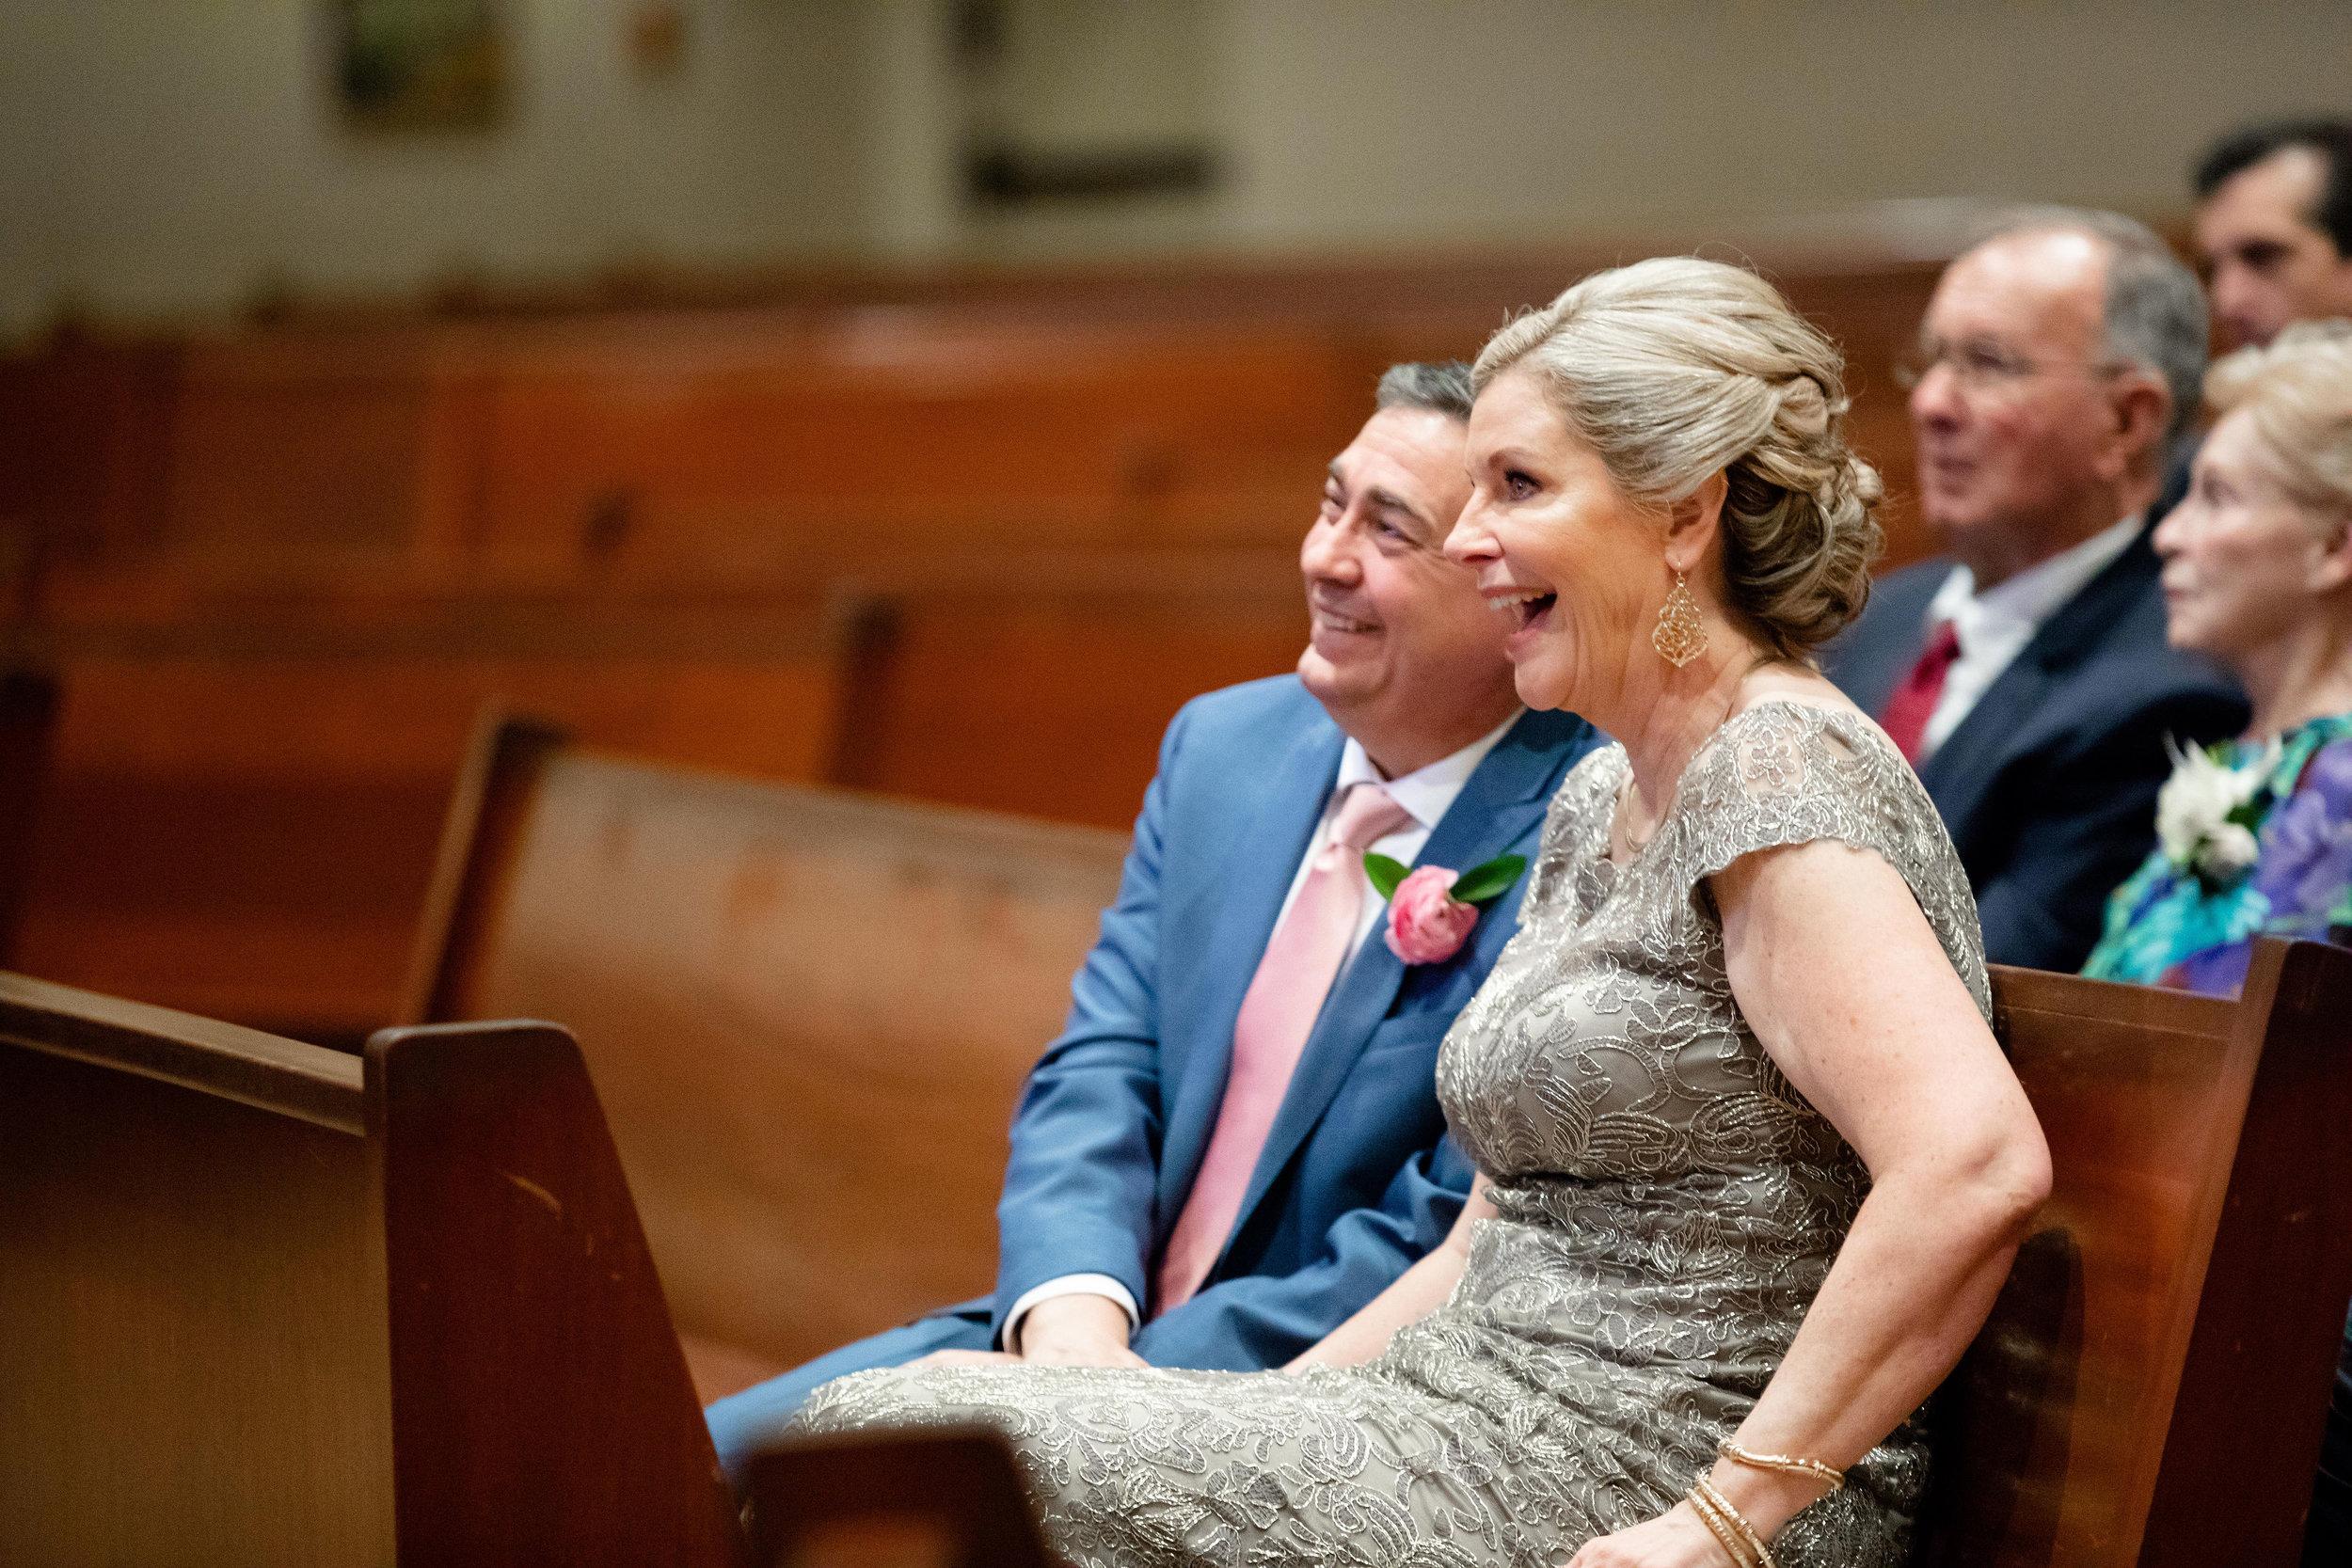 McElravey_Wedding_CarolineLimaPhotography_2018_127.jpg